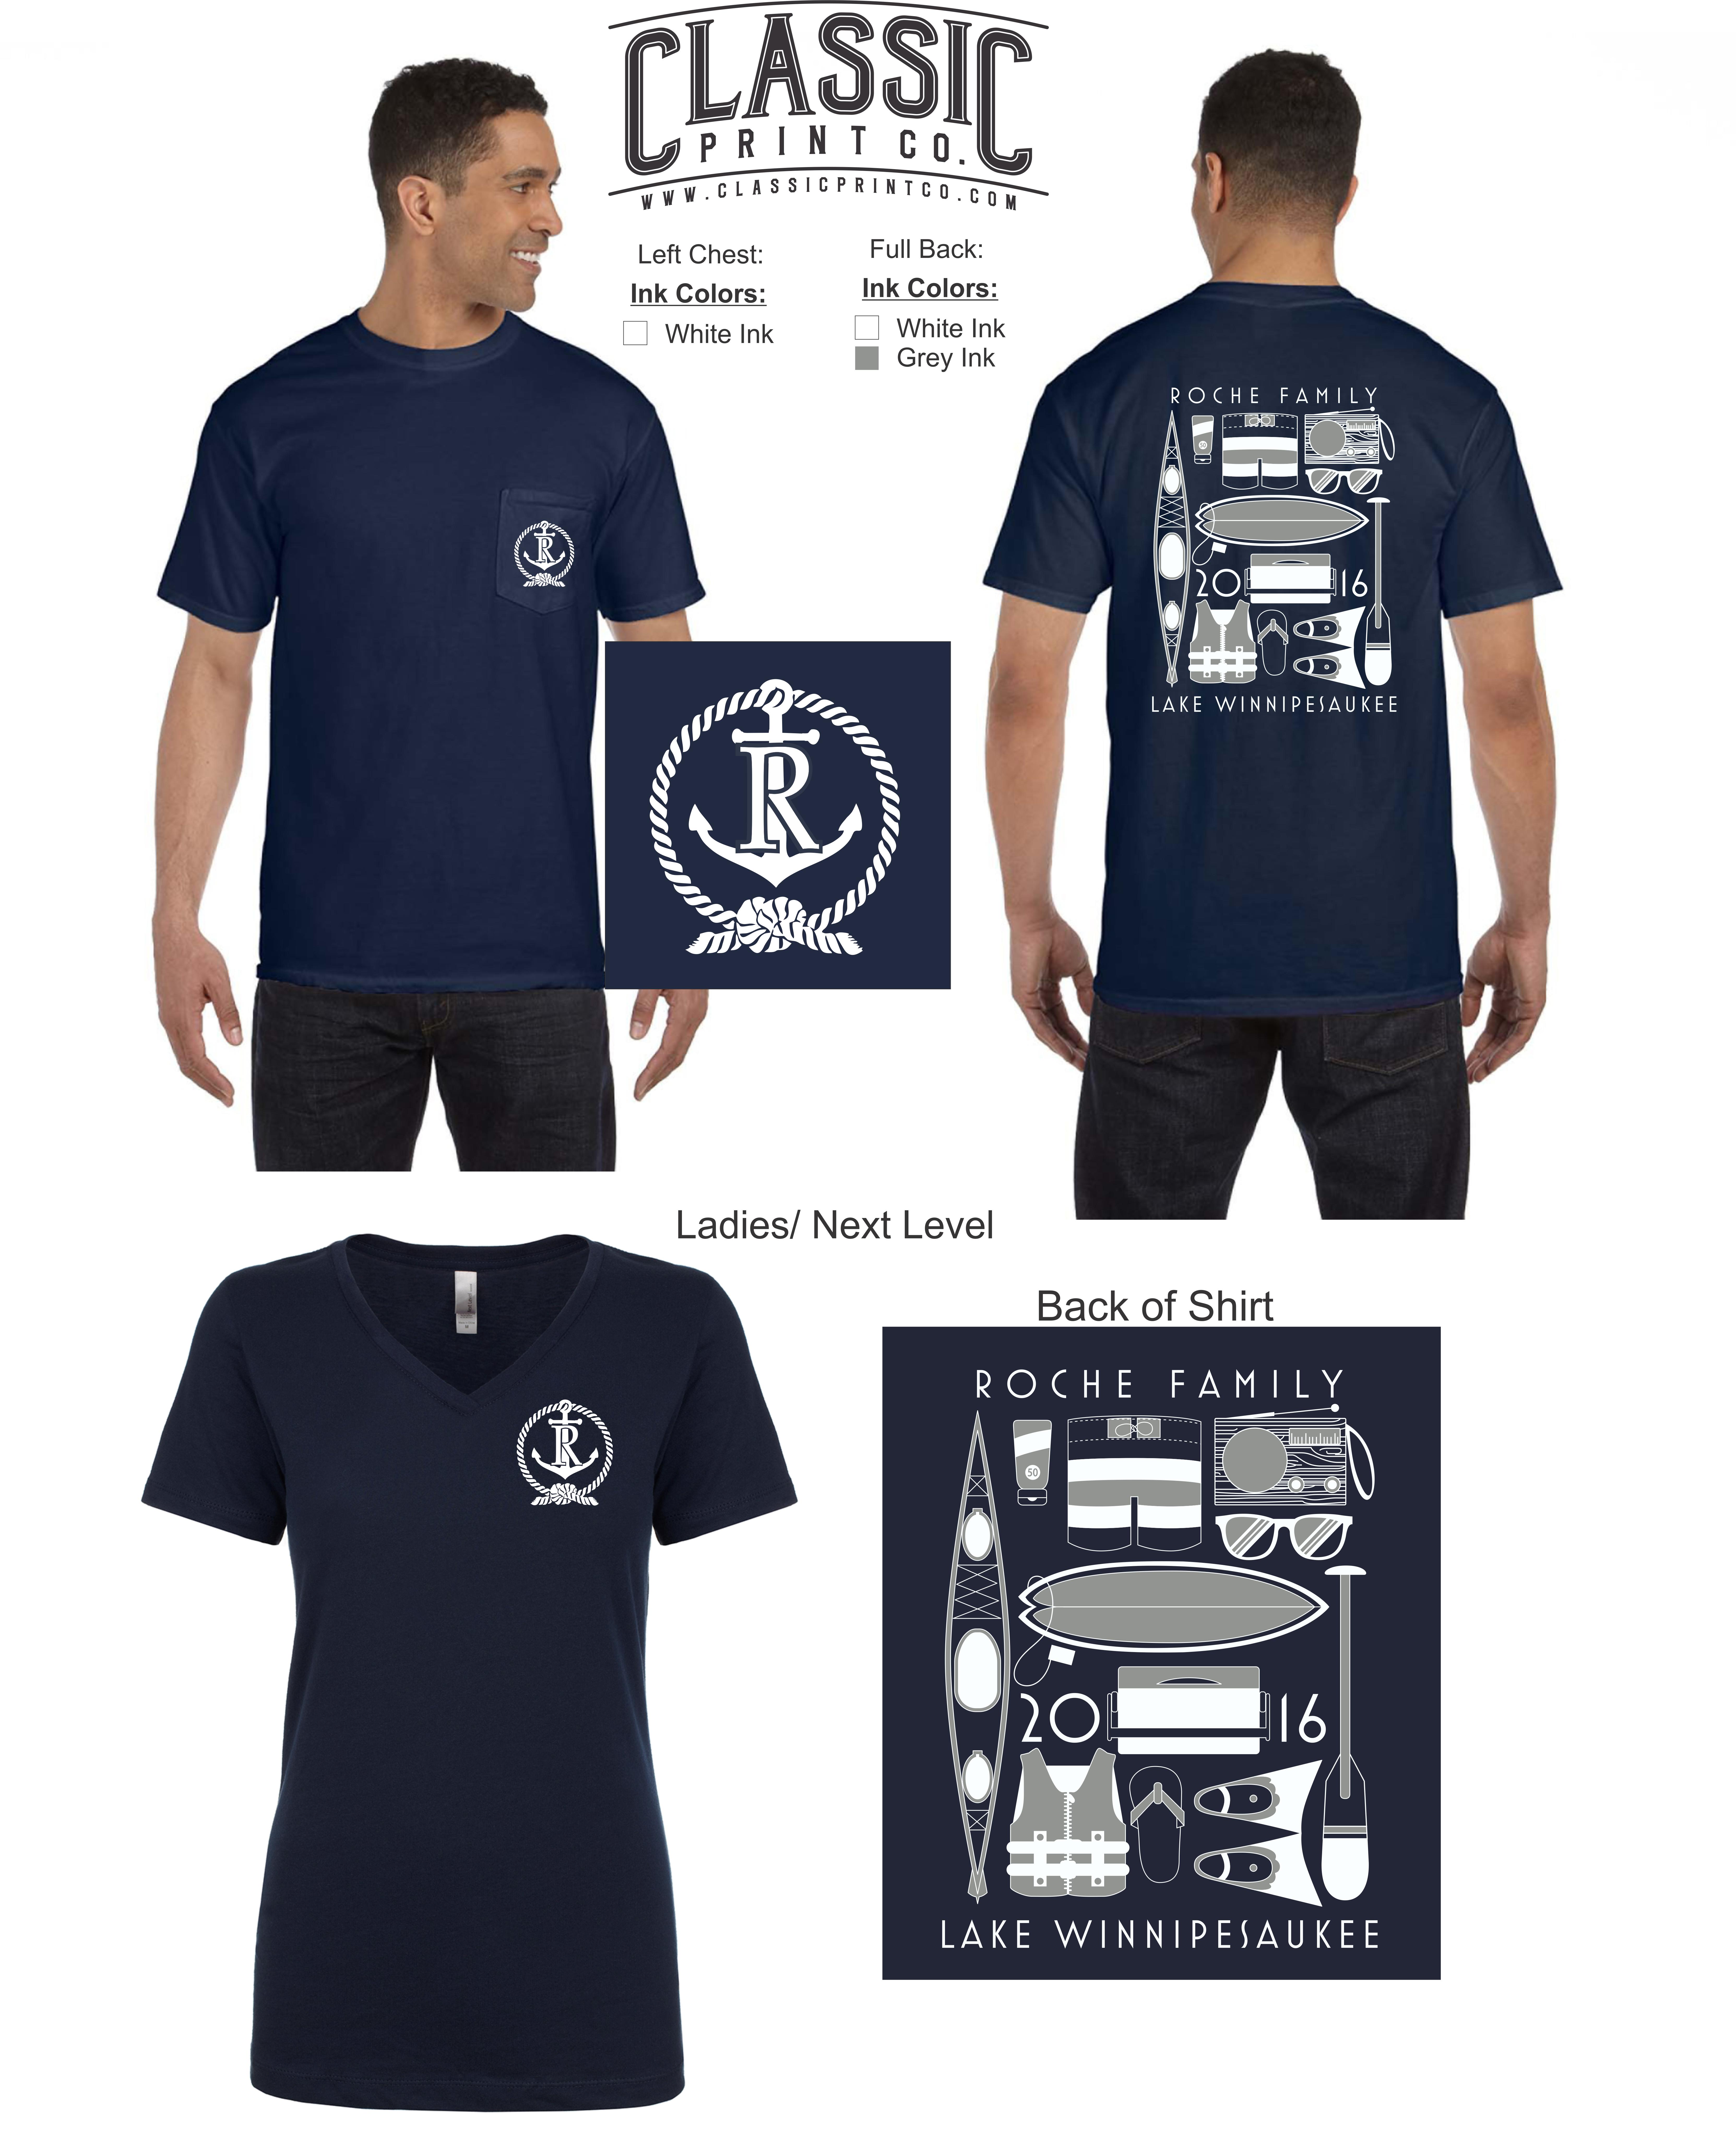 e8cc7eb3e Family Reunion Shirts! #lake #familyreunion. Find this Pin and more on  tshirts ...